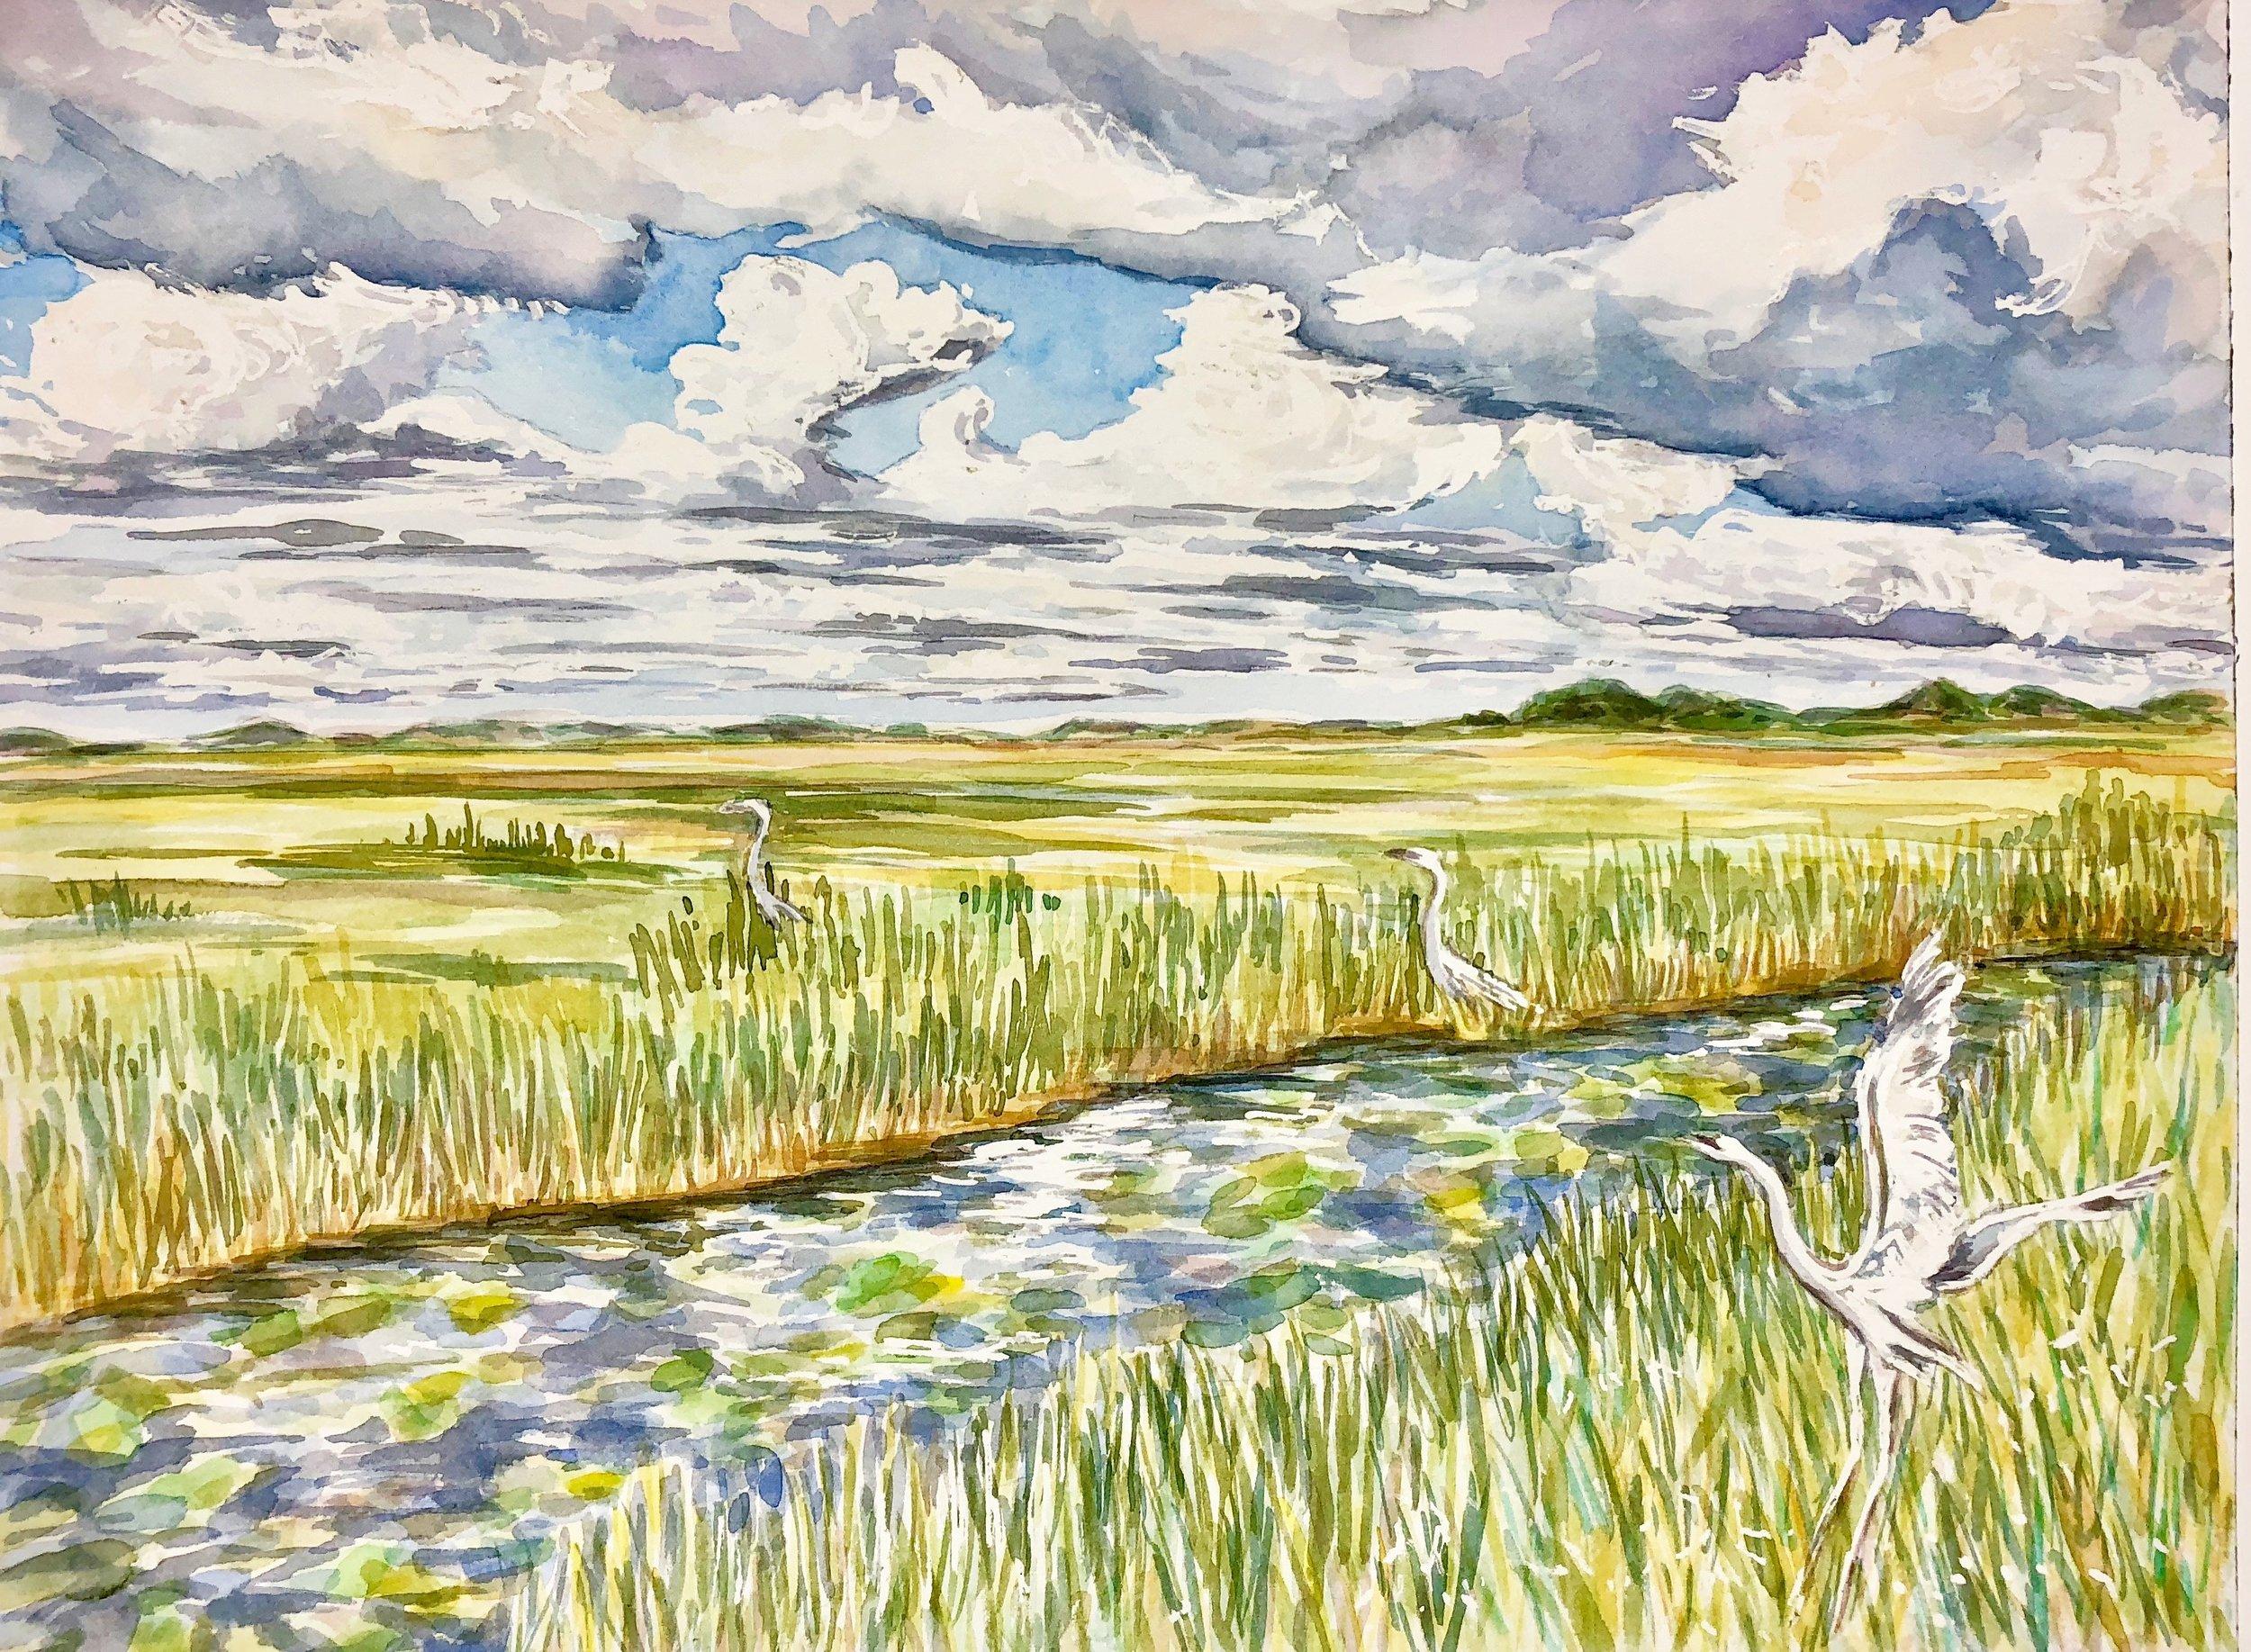 Trip of Cranes, Everglades National Park - watercolor